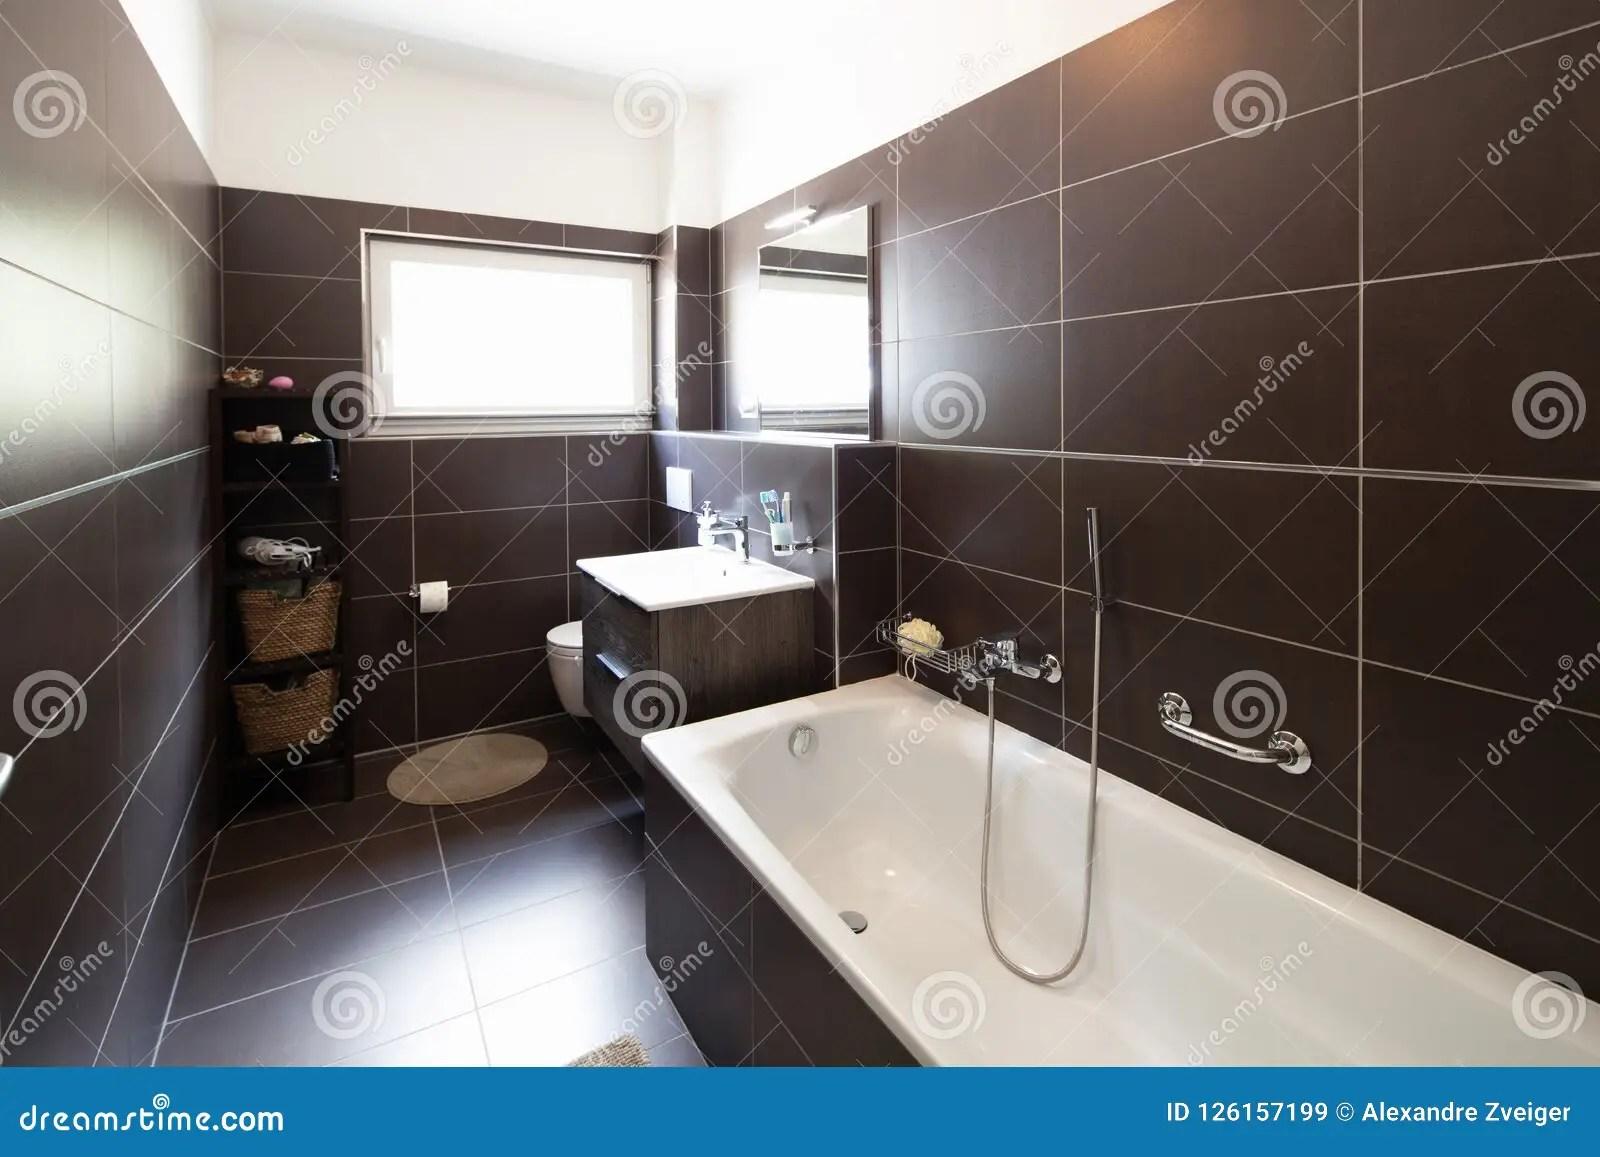 https www dreamstime com modern bathroom brown tiles window nobody insid bath wide modern bathroom brown tiles window image126157199